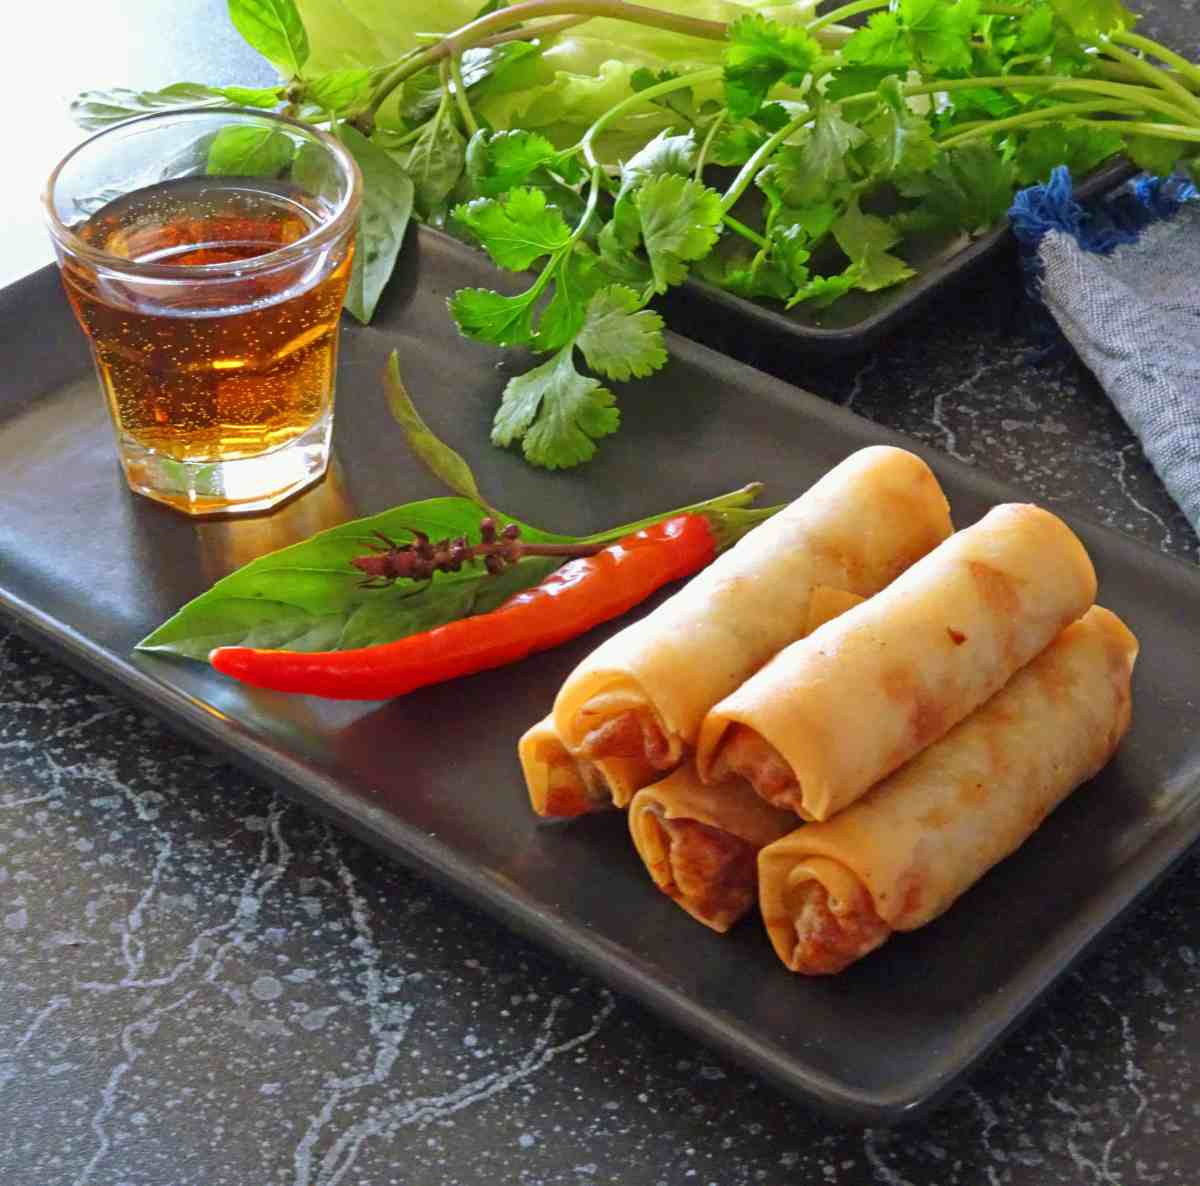 Vietnamese Fried Spring Rolls Cha Gio Scruff StephVietnamese Fried Spring Rolls